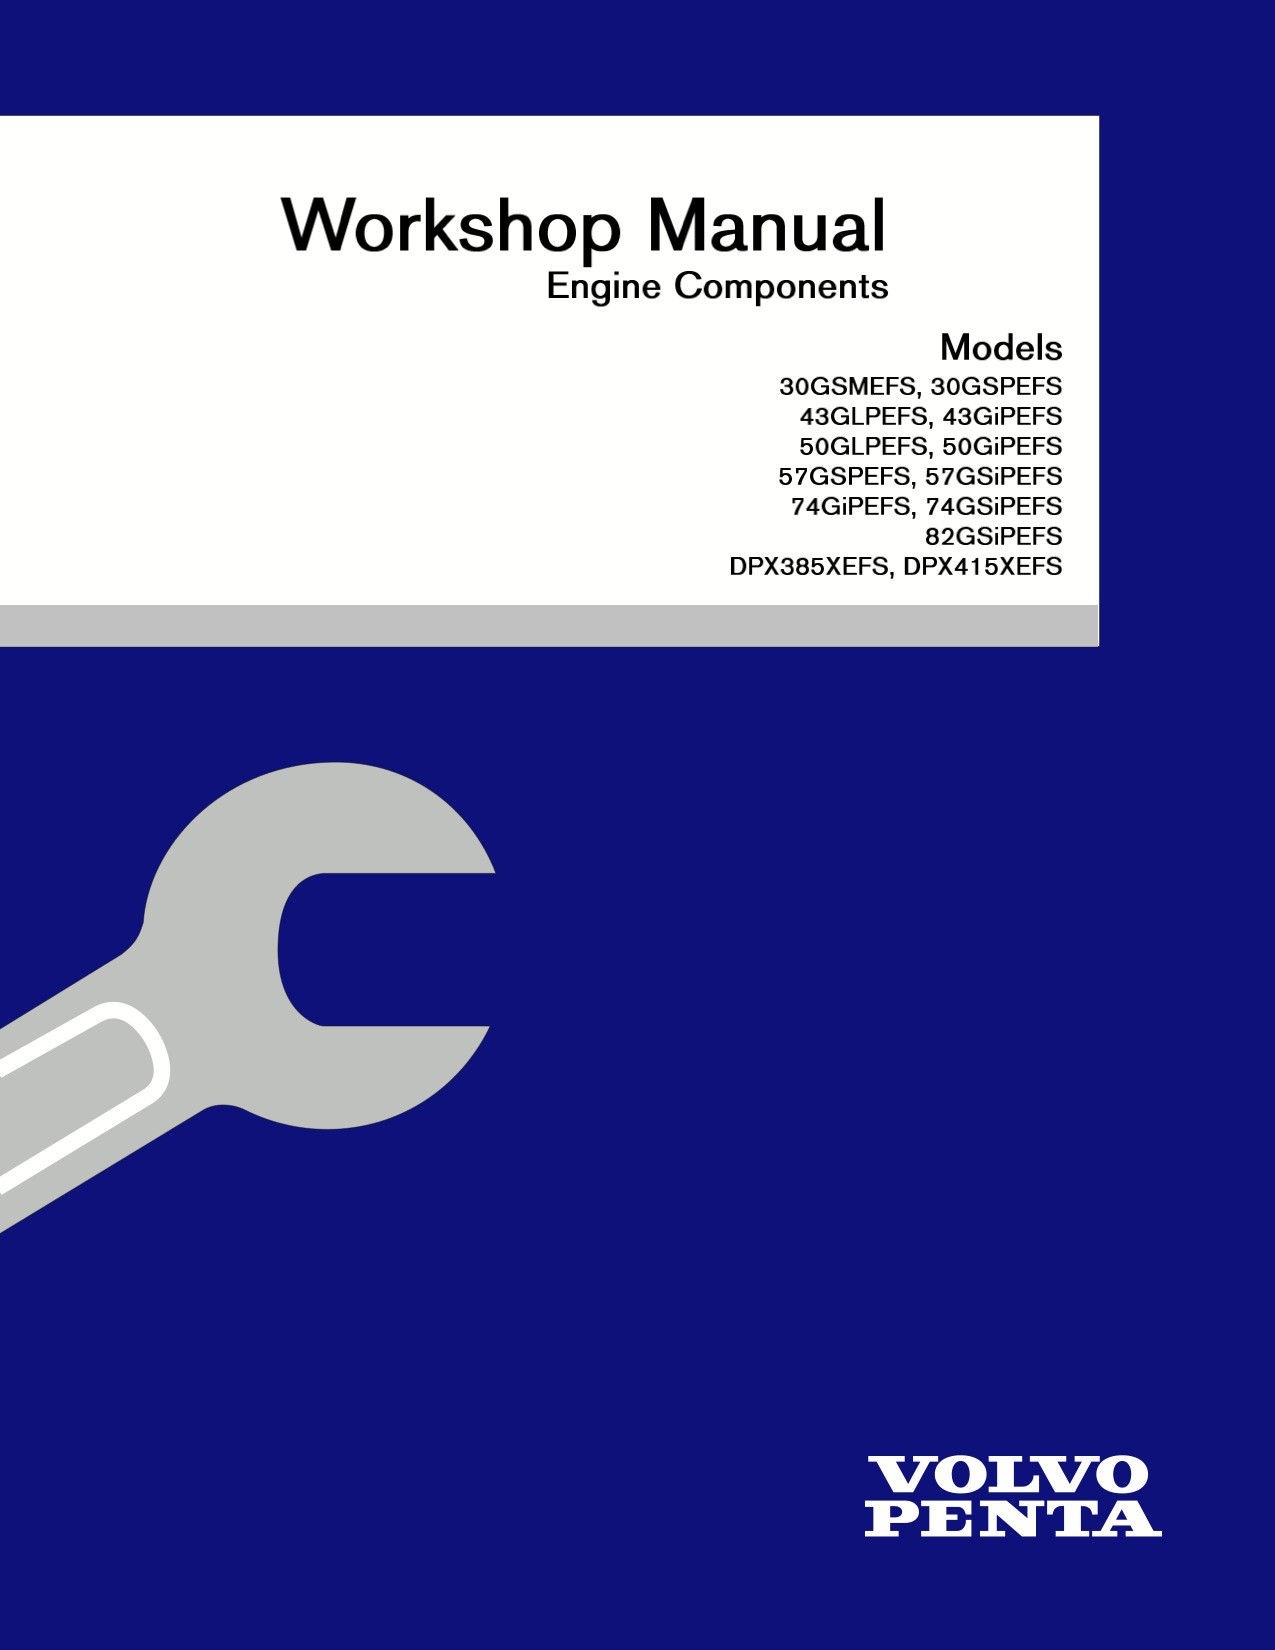 manuel volvo penta moteur ef 2000 rh engine manual com workshop manual volvo penta d12 workshop manual volvo penta